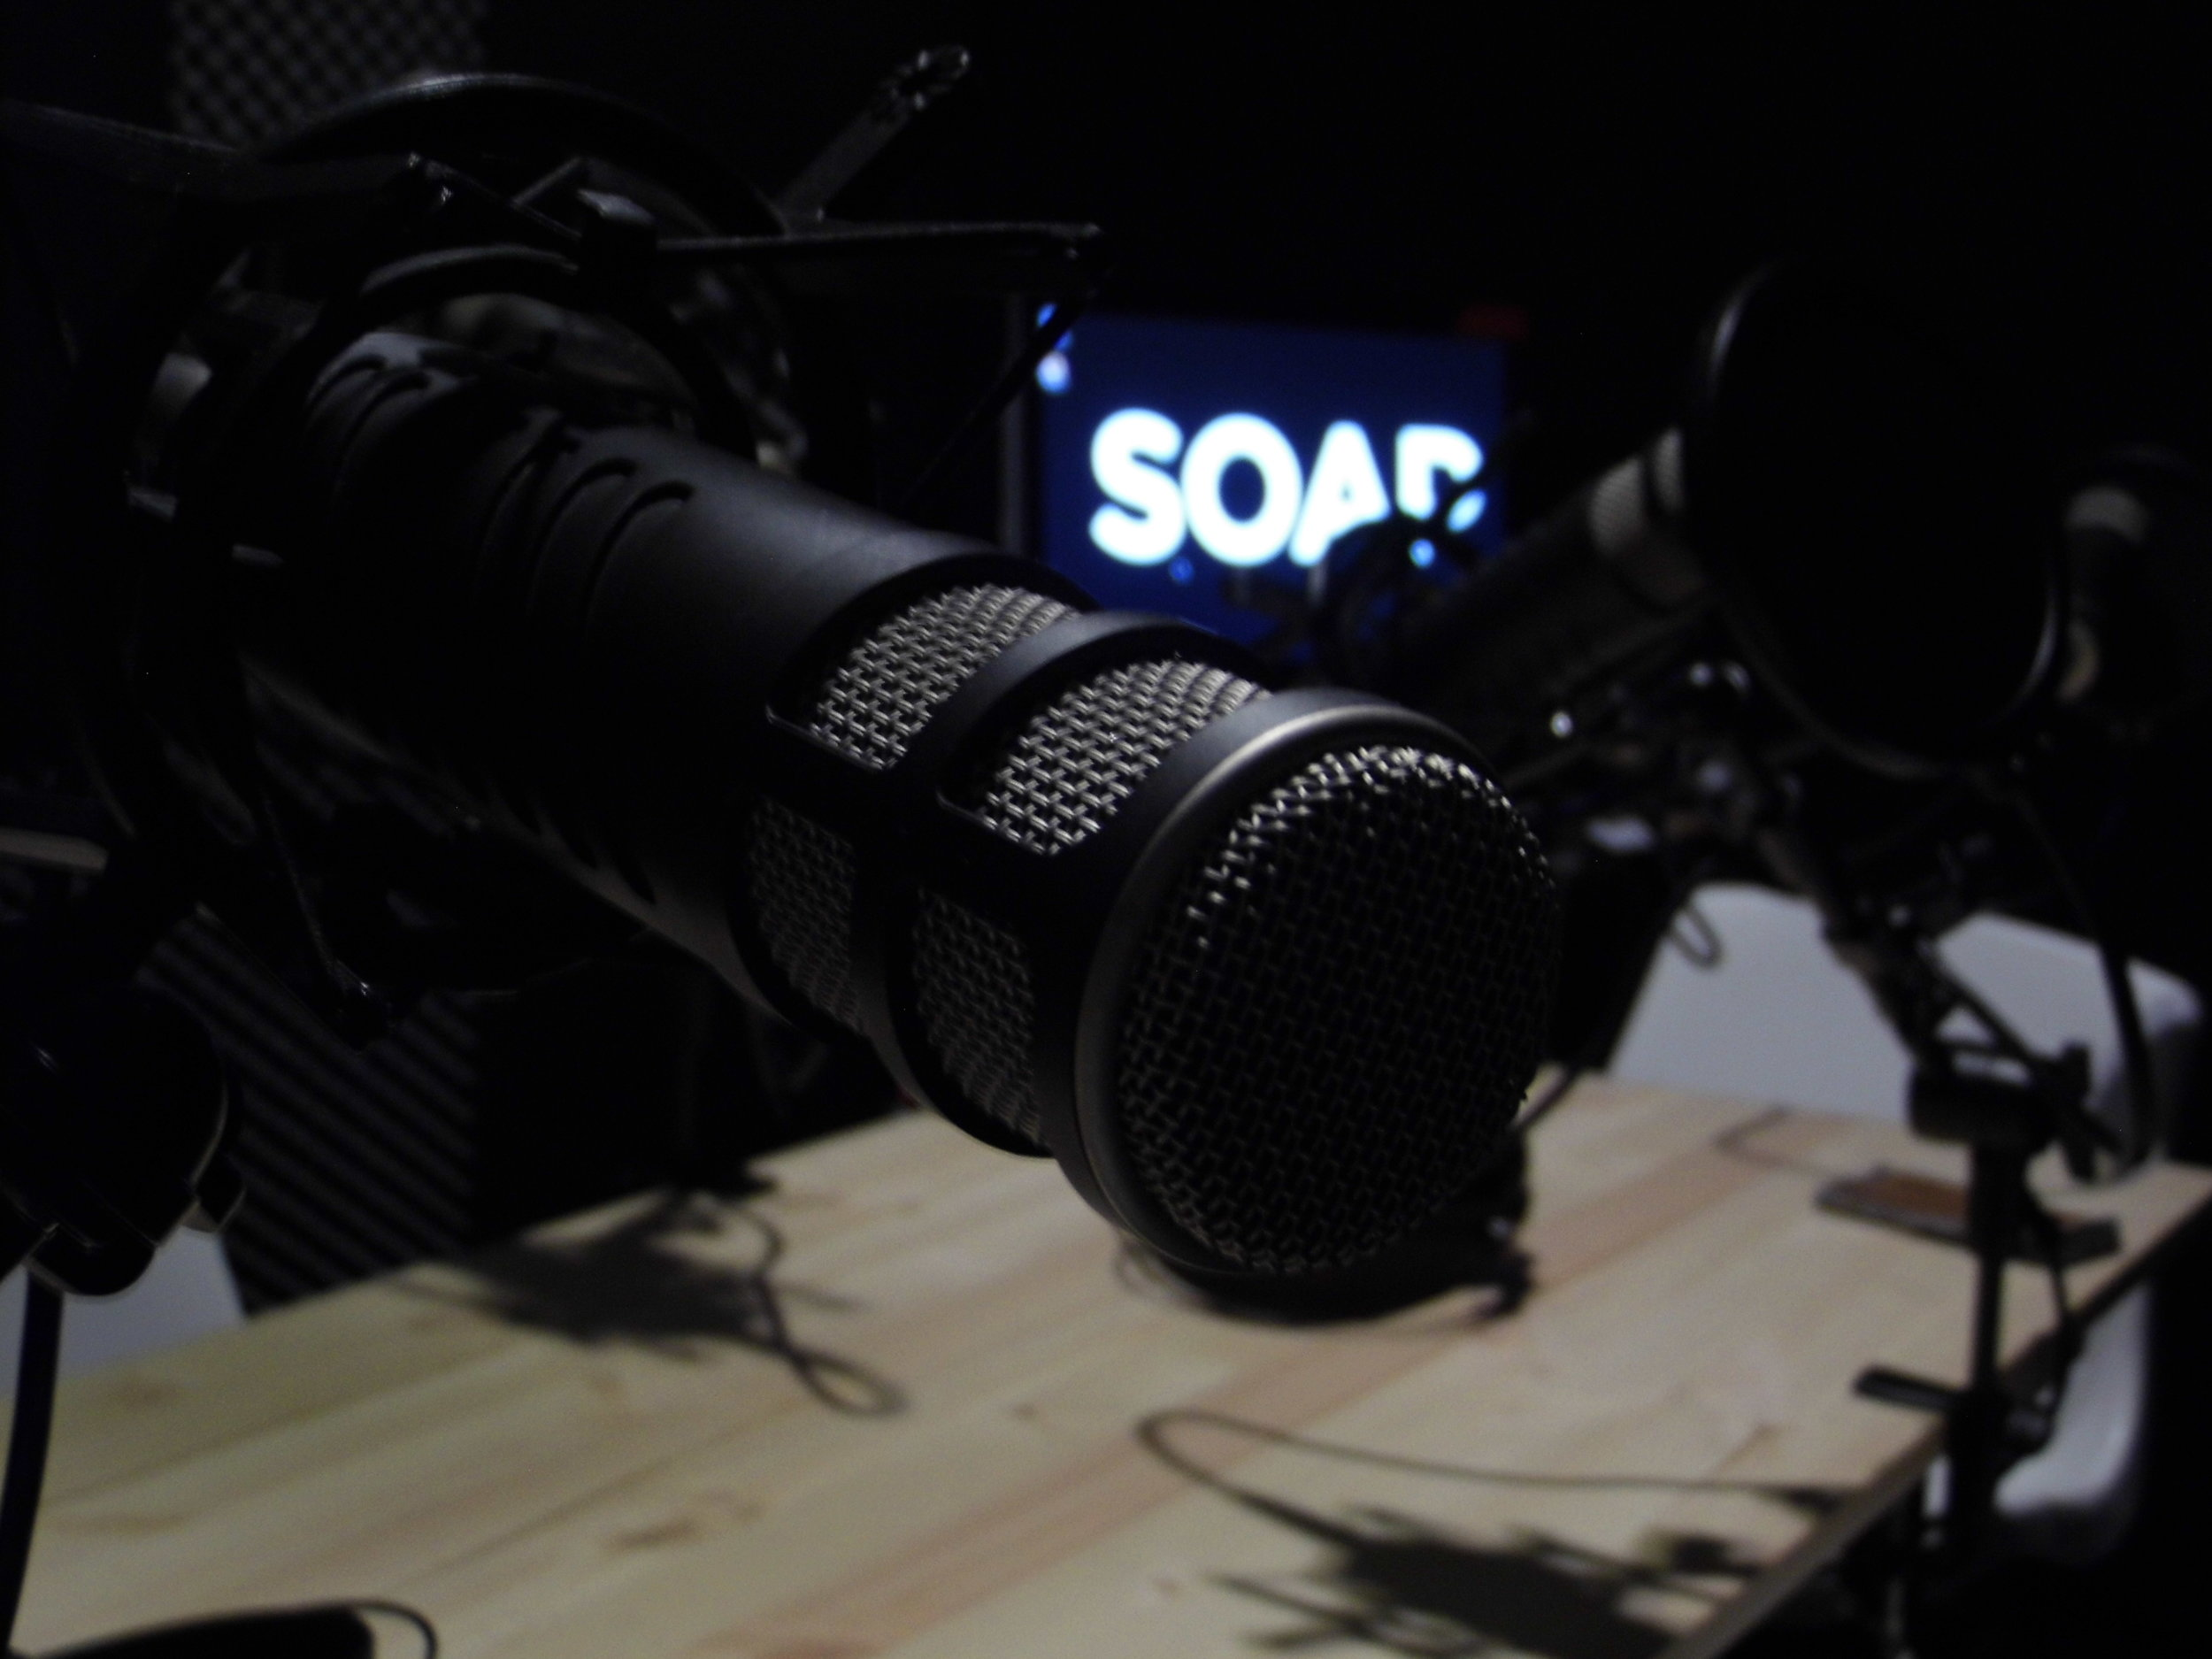 Podcast studio Hire, Podcast hire, hire recording studio, podcast studio london, soap, on-soap